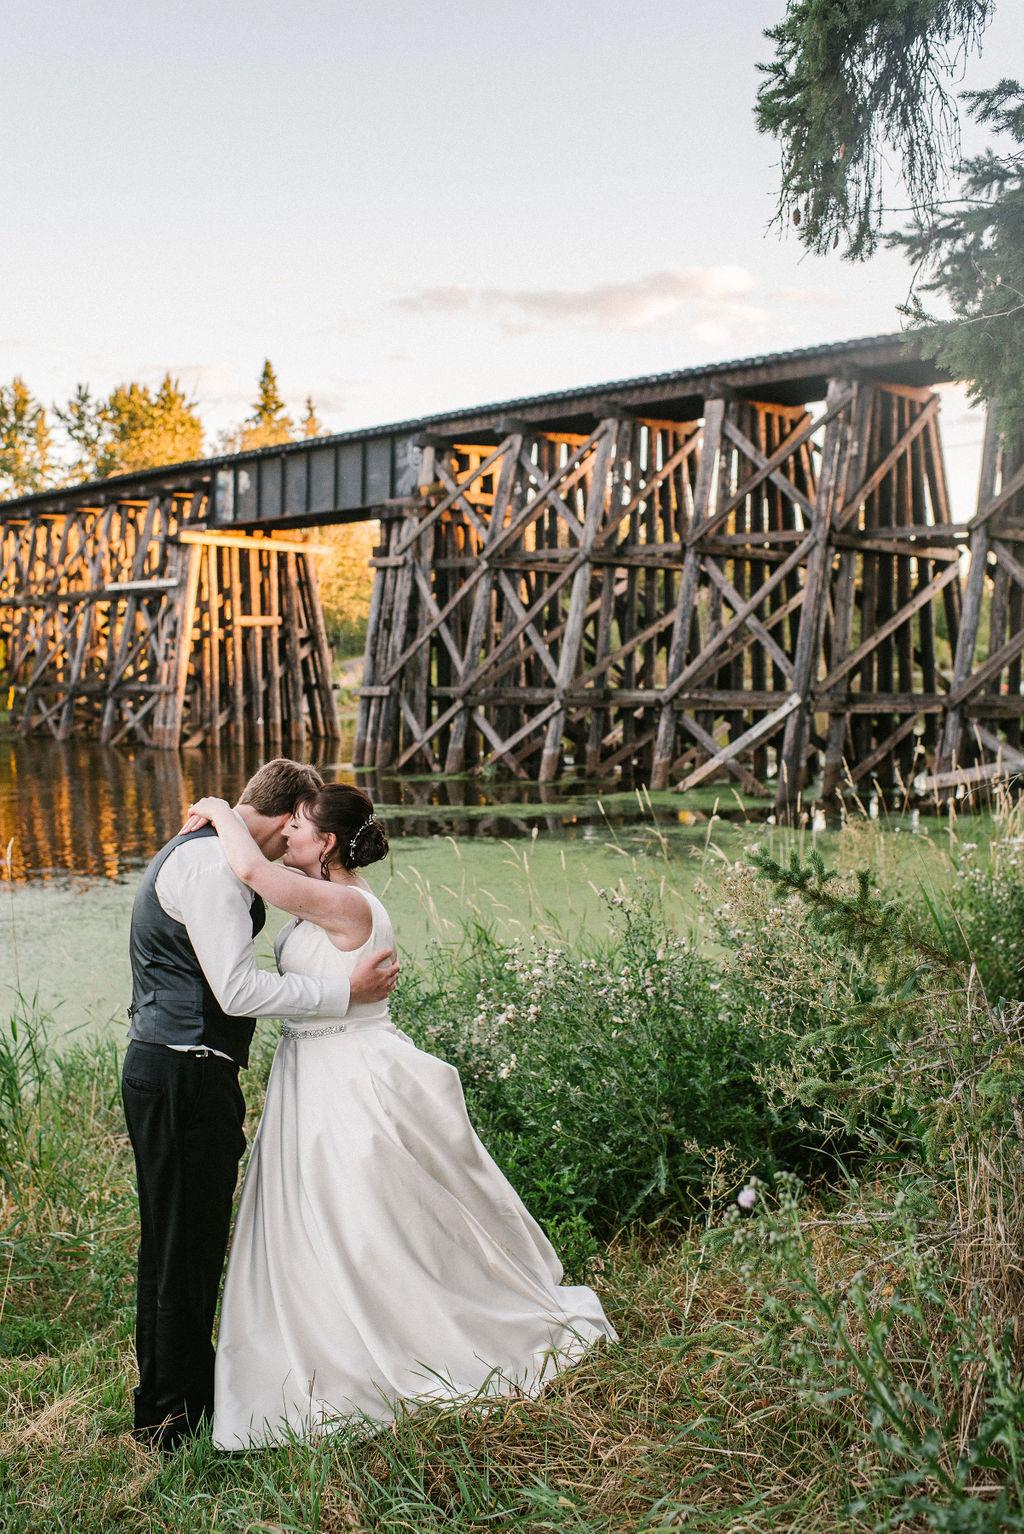 Sunset Wedding Photos, Bride and Groom